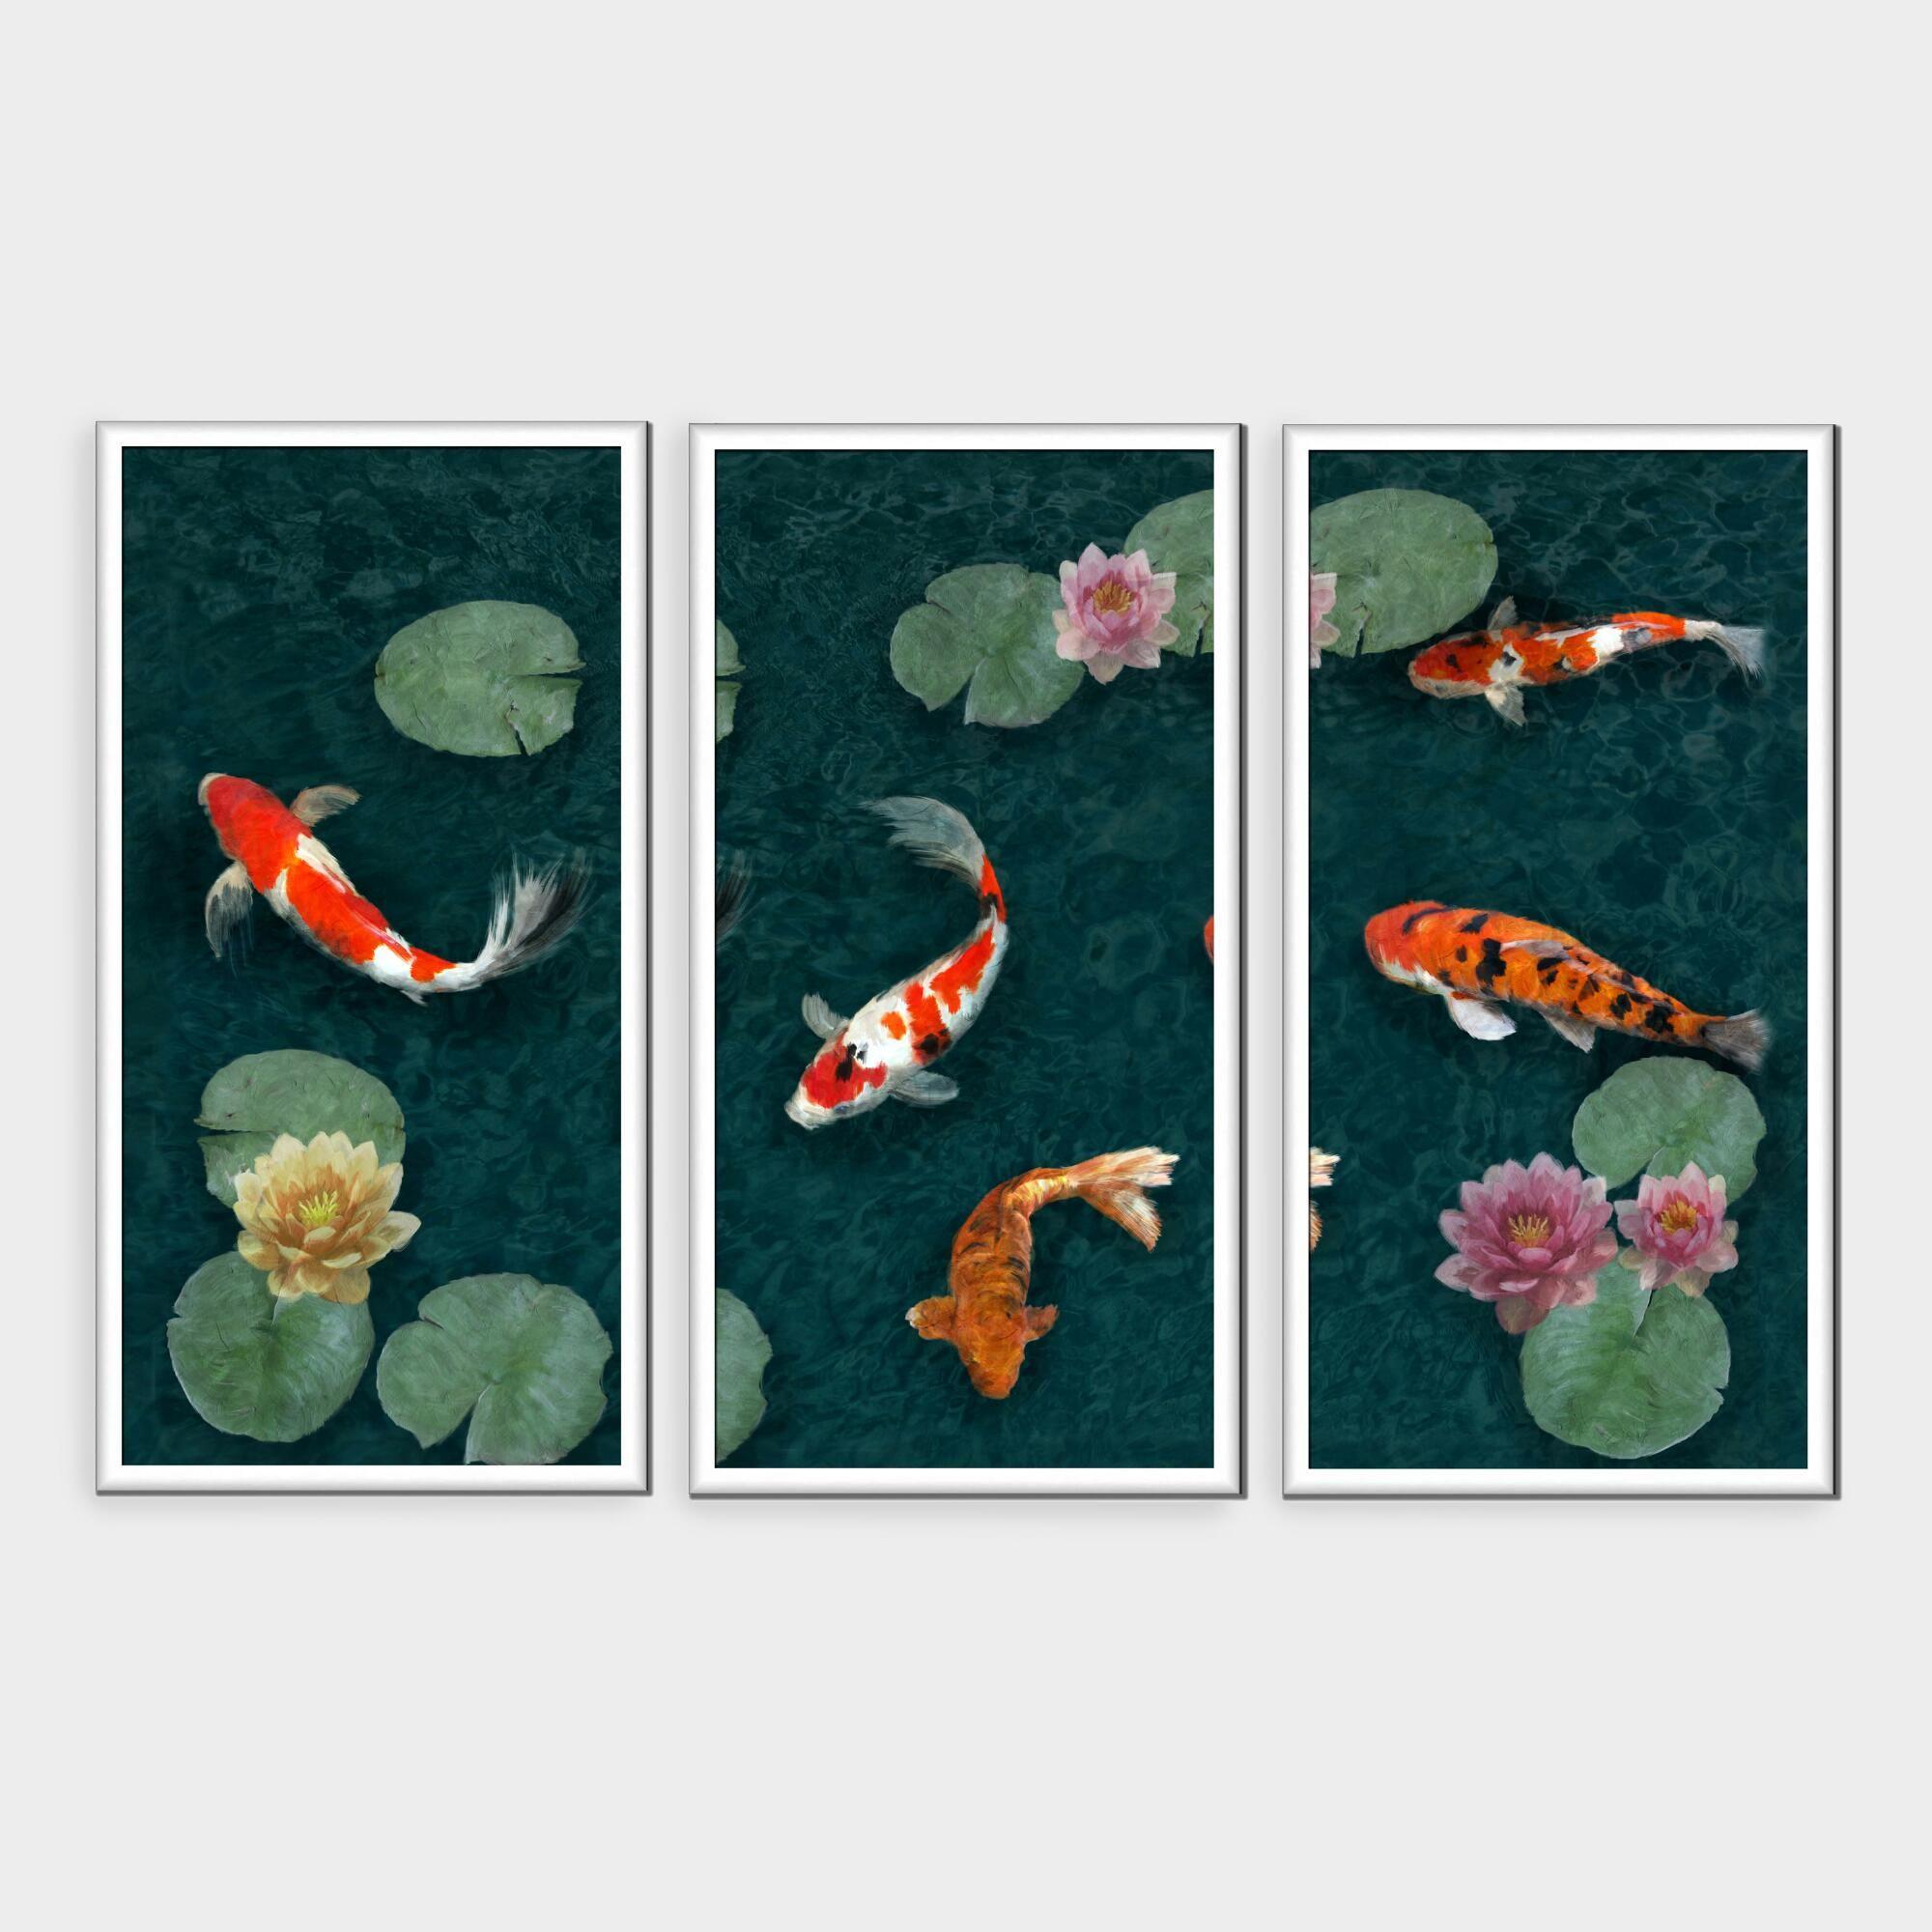 Twilight In Koi Pond >> Koi Pond Triptych Shadowbox Framed Canvas Wall Art Set Of 3 Green